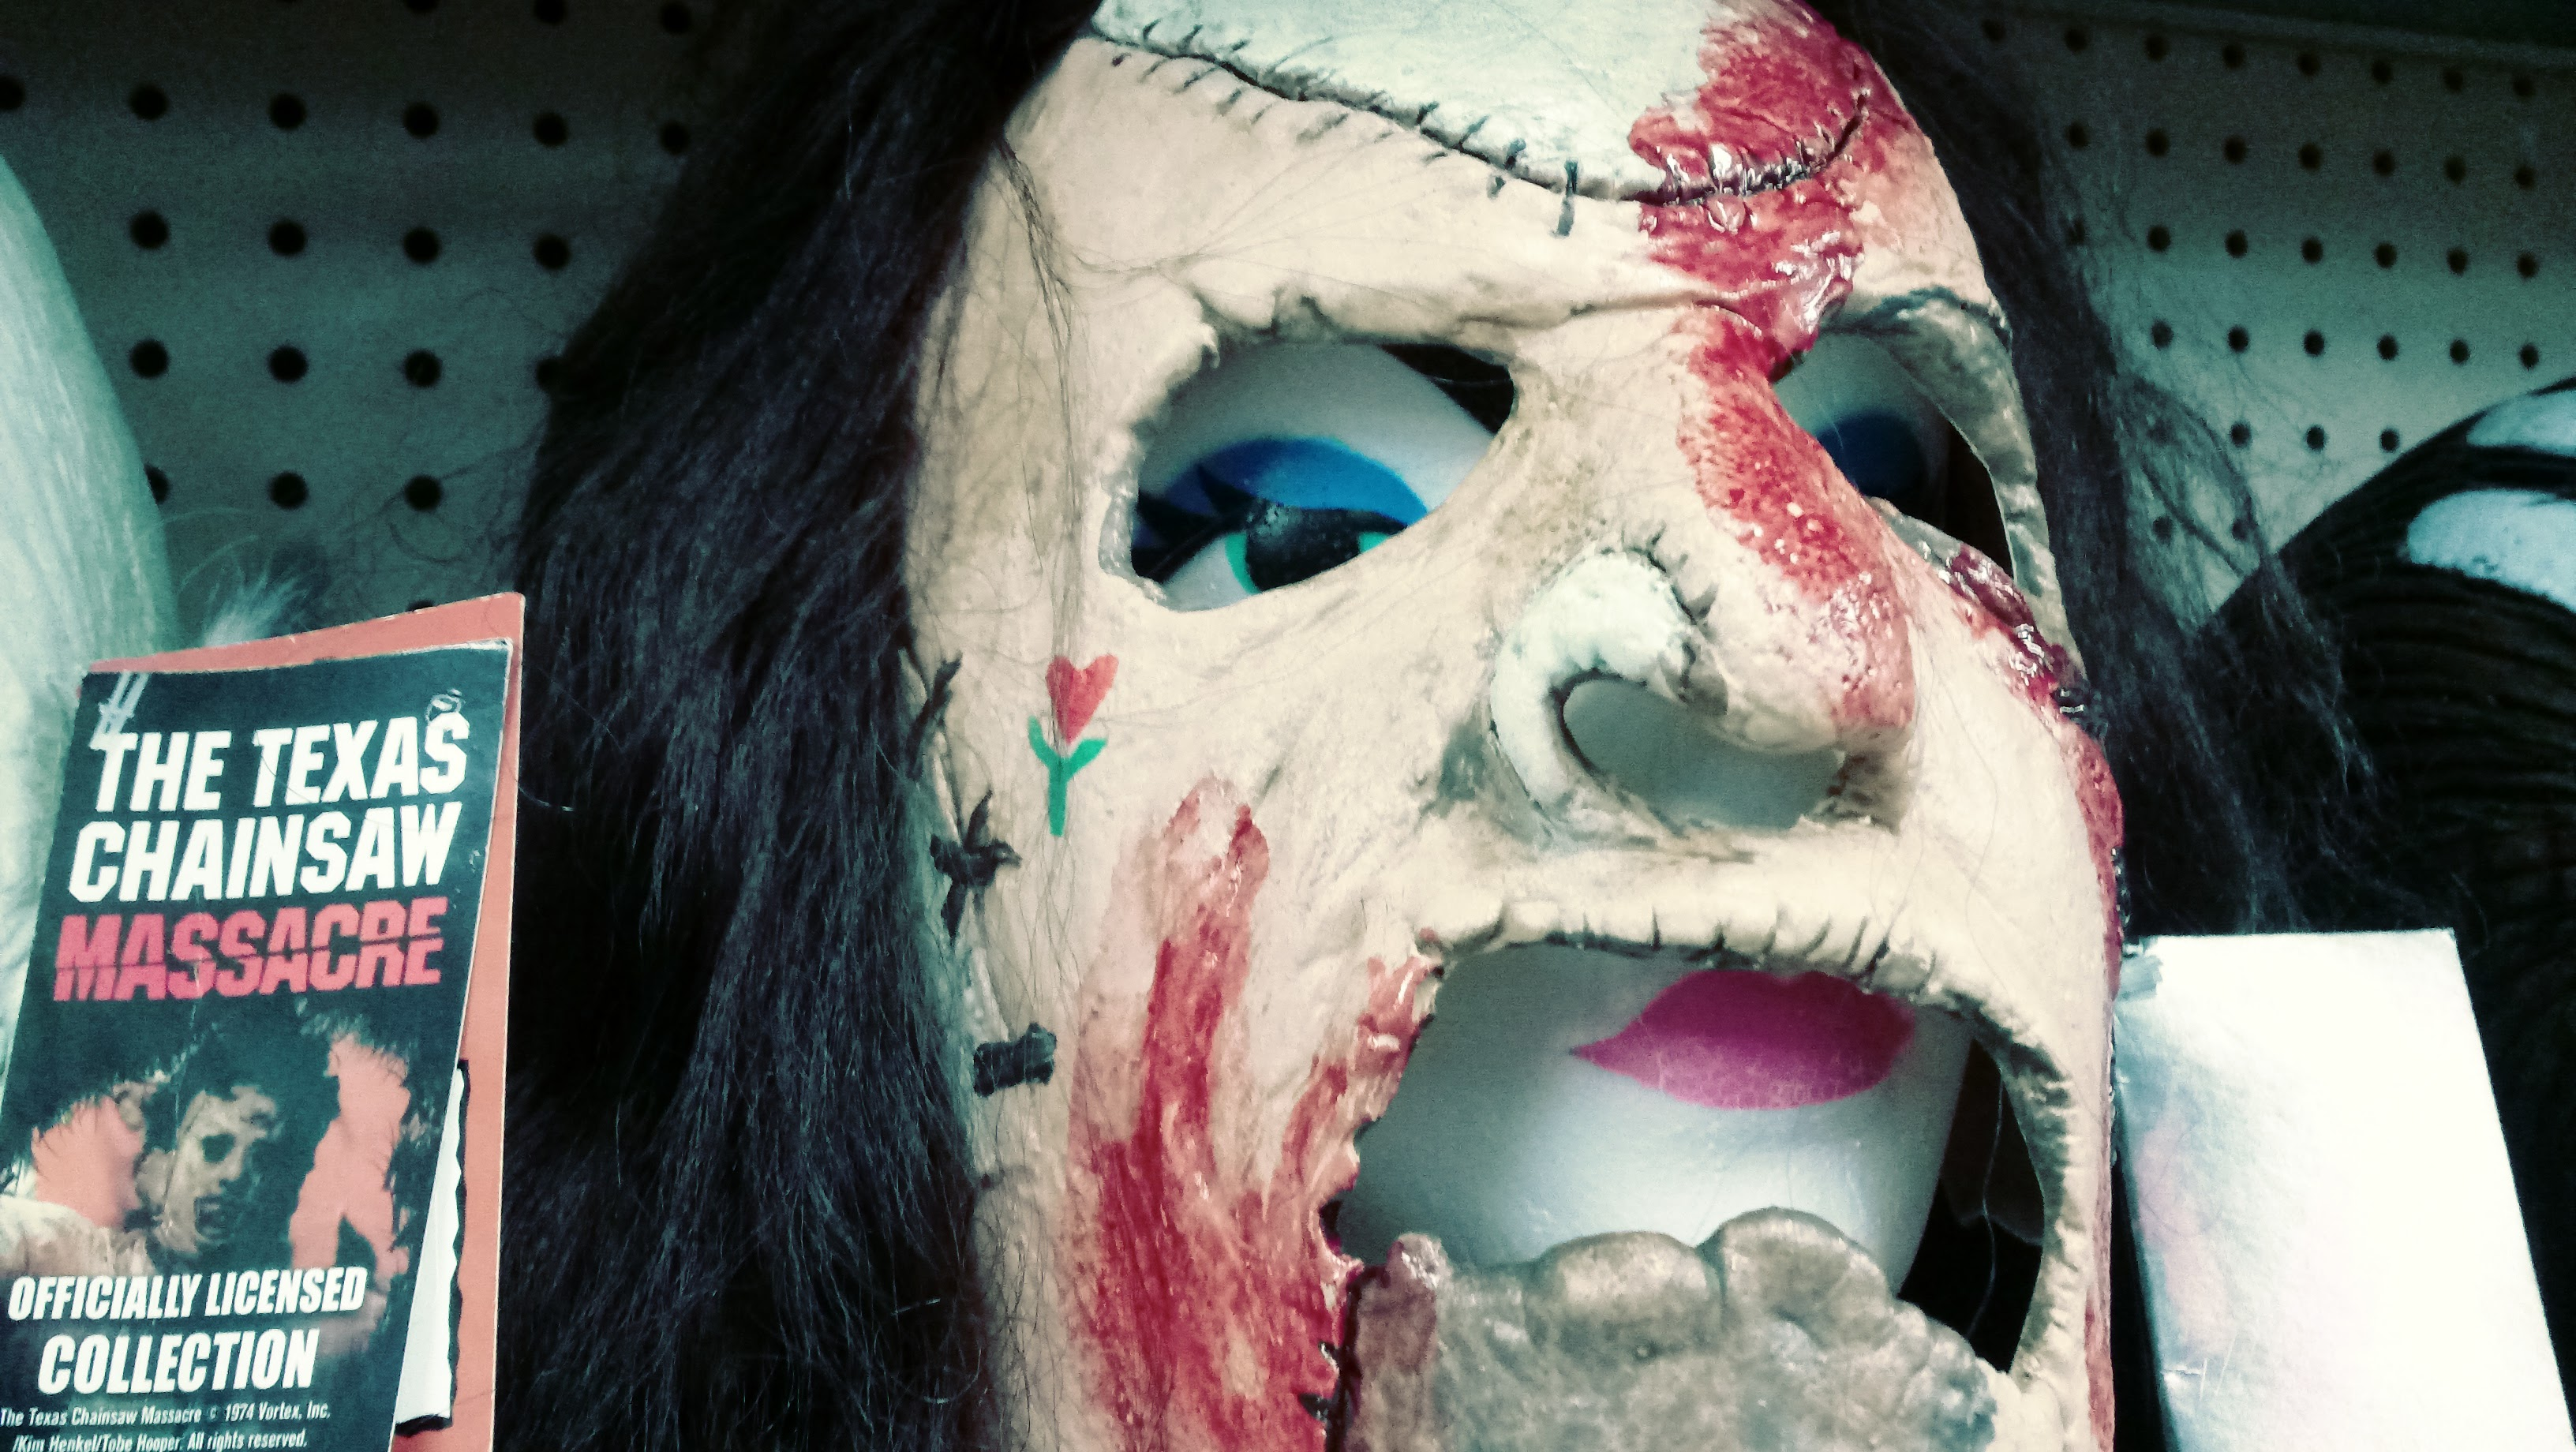 nick nackery leatherface ed gein texas chainsaw massacre mask